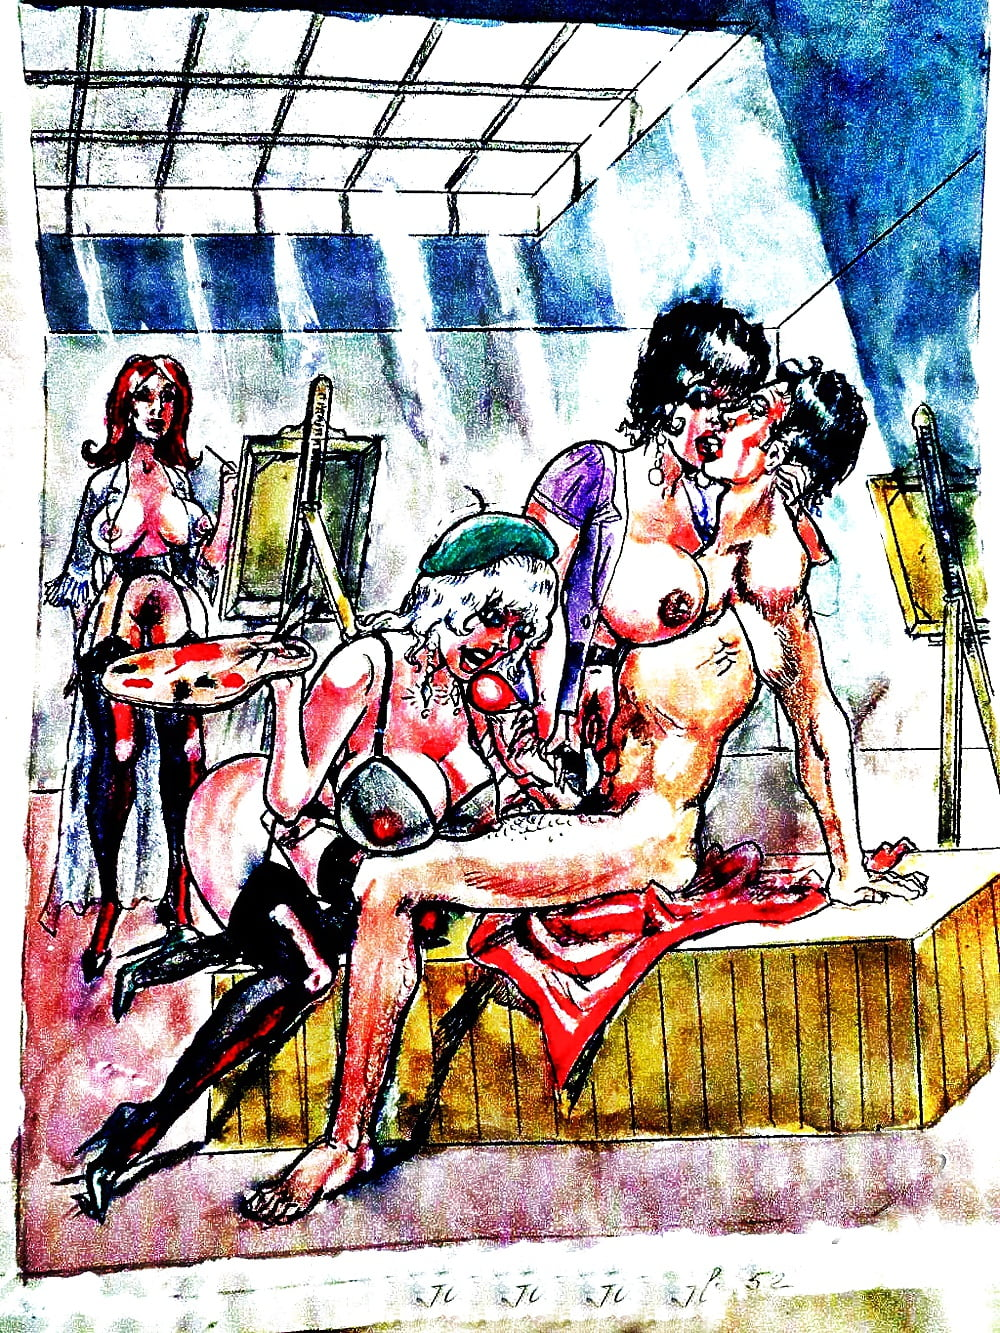 Aerte Porno see and save as arte porno porn pict - 4crot